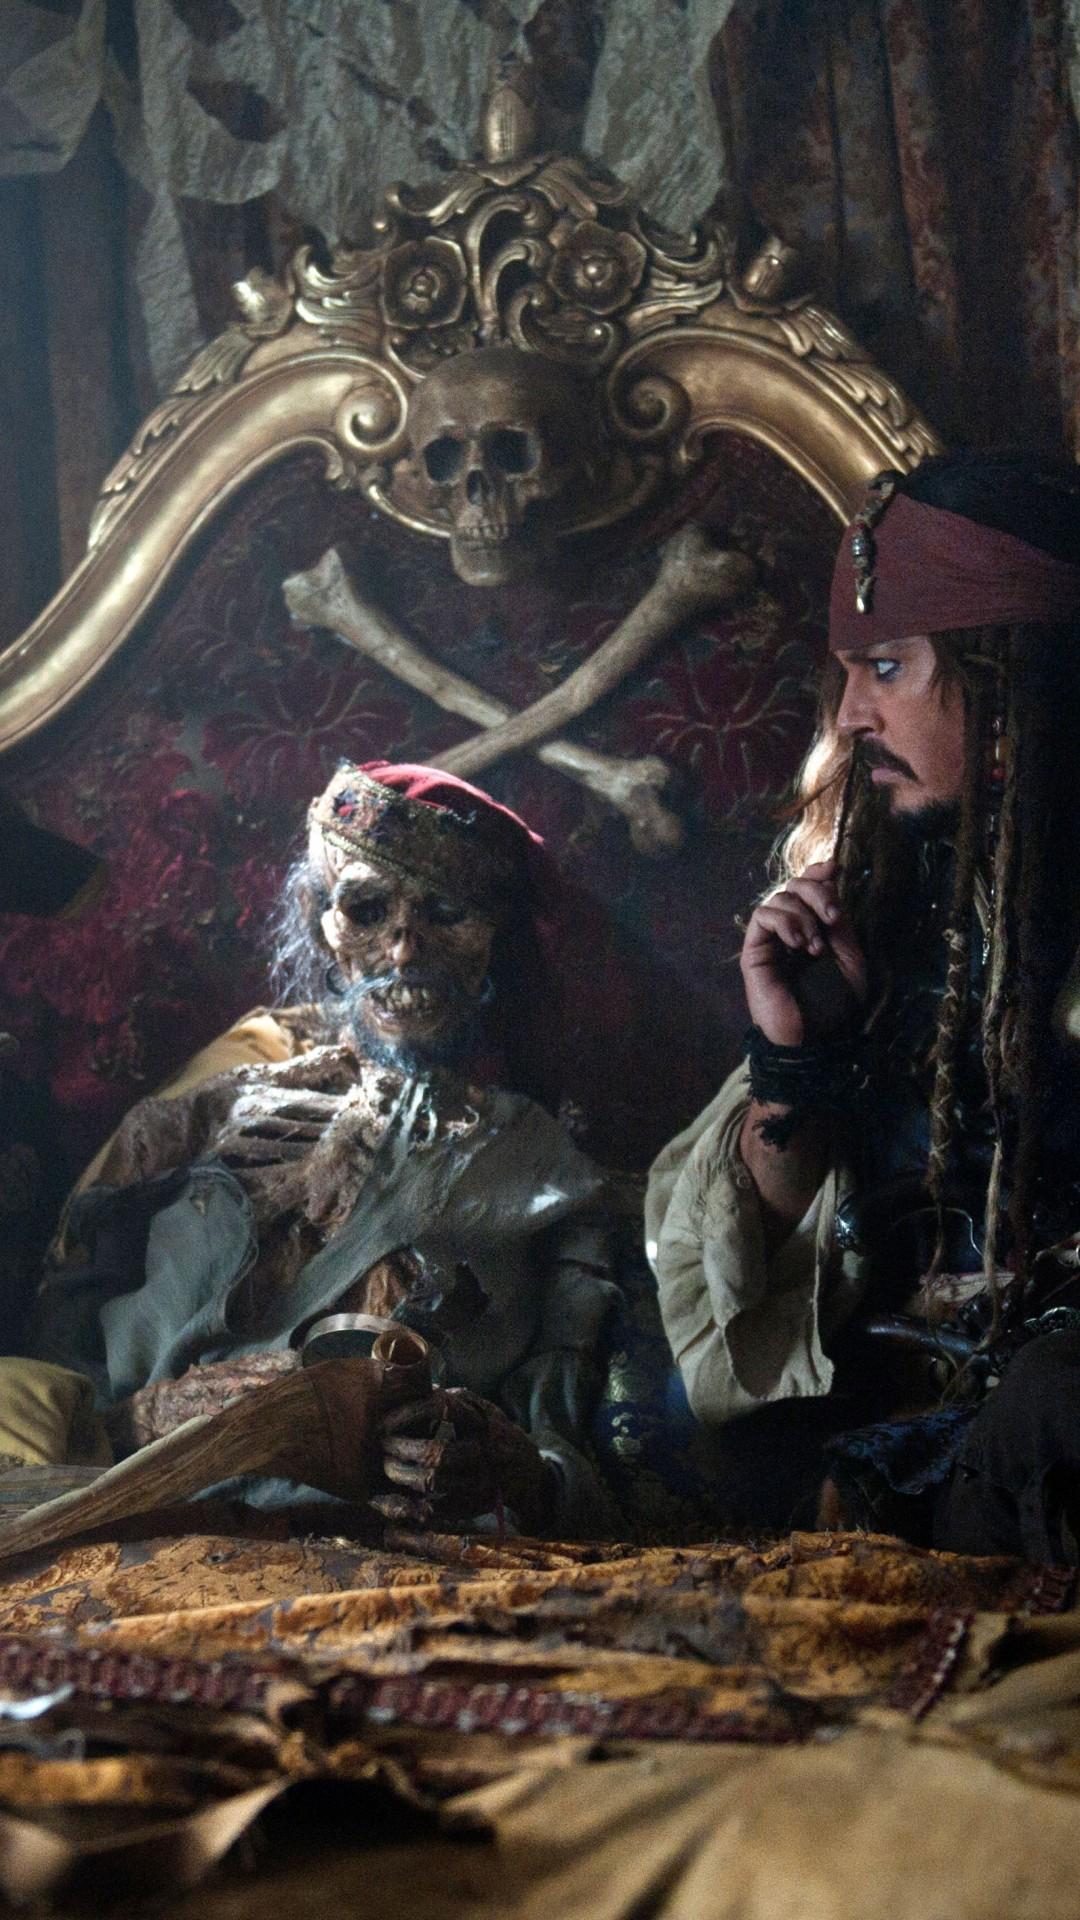 Wallpaper Pirates Of The Caribbean Dead Men Tell No Tales